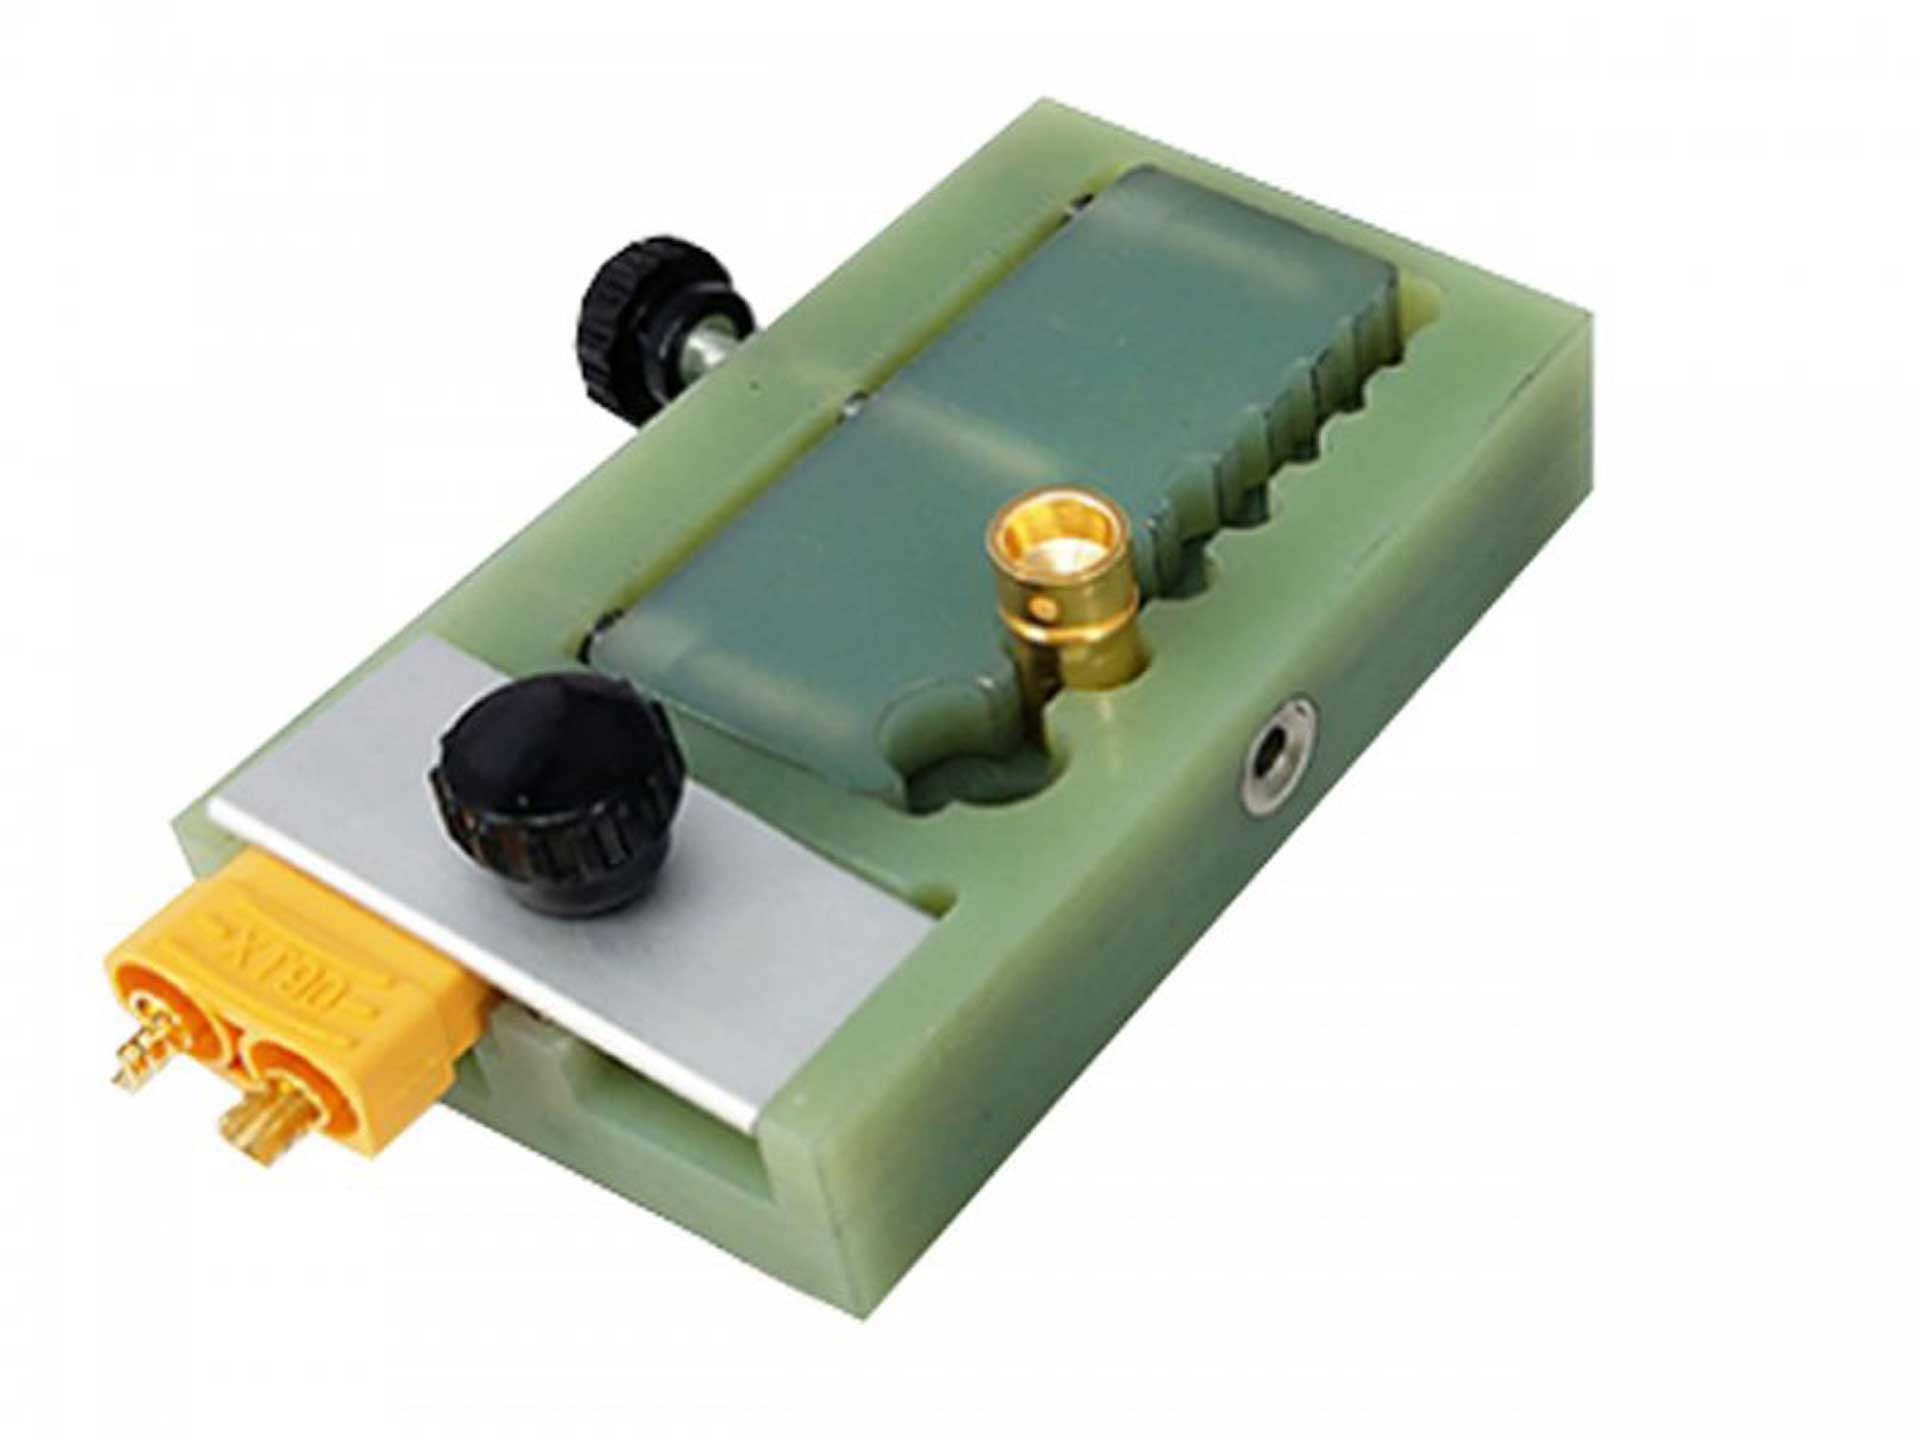 PICHLER Connector block EVO ( soldering aid )